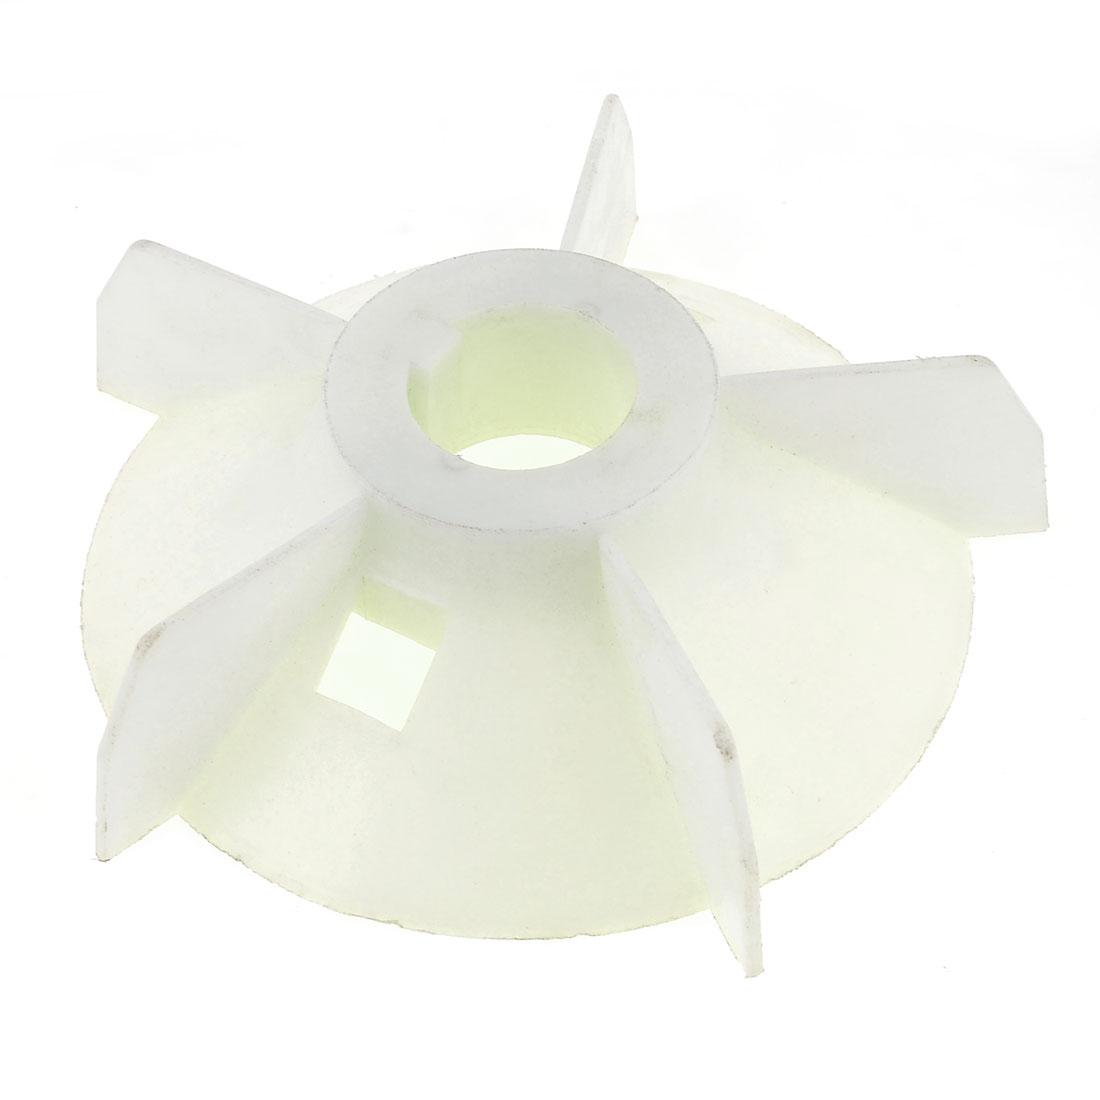 Y2-132 Replacement White Plastic Inner Dia 3.7cm Five Impeller Motor Fan Vane